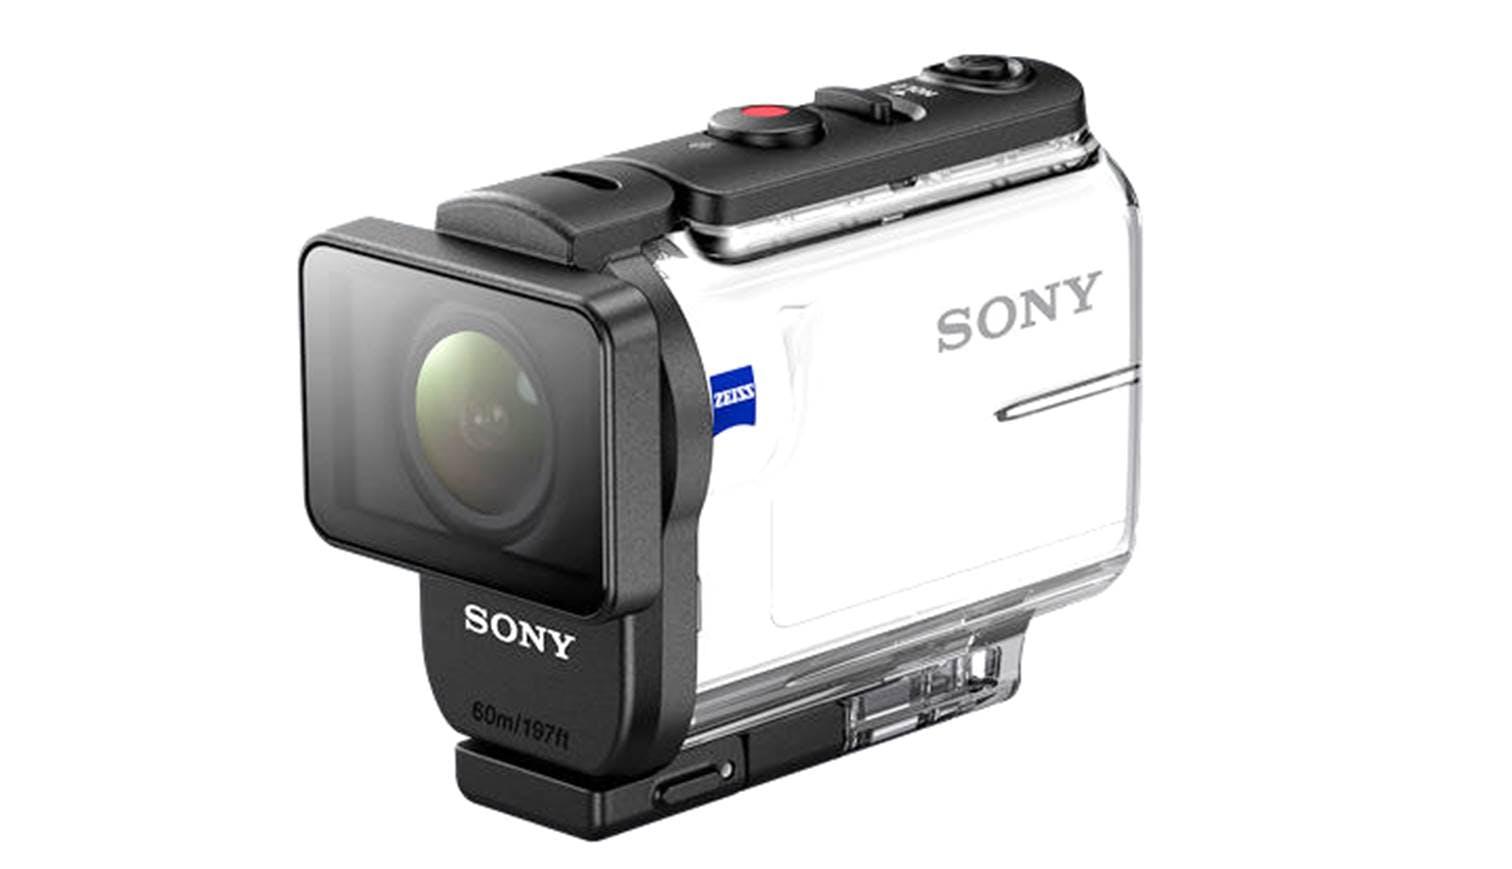 Camera Sony Action Cam Waterproof Case sony hdr as300 action camera with waterproof case harvey norman case